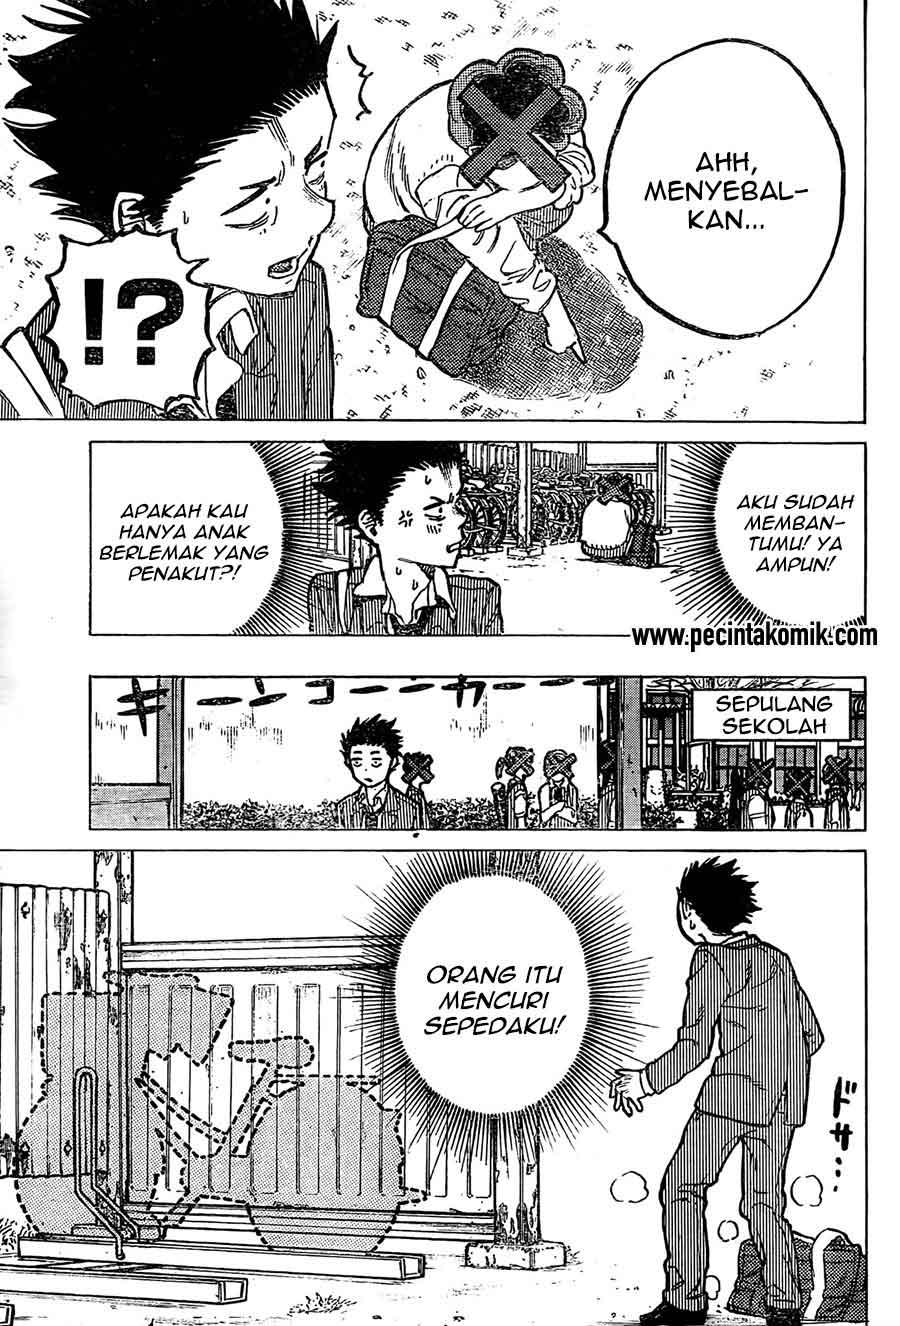 Koe no Katachi Chapter 08-10